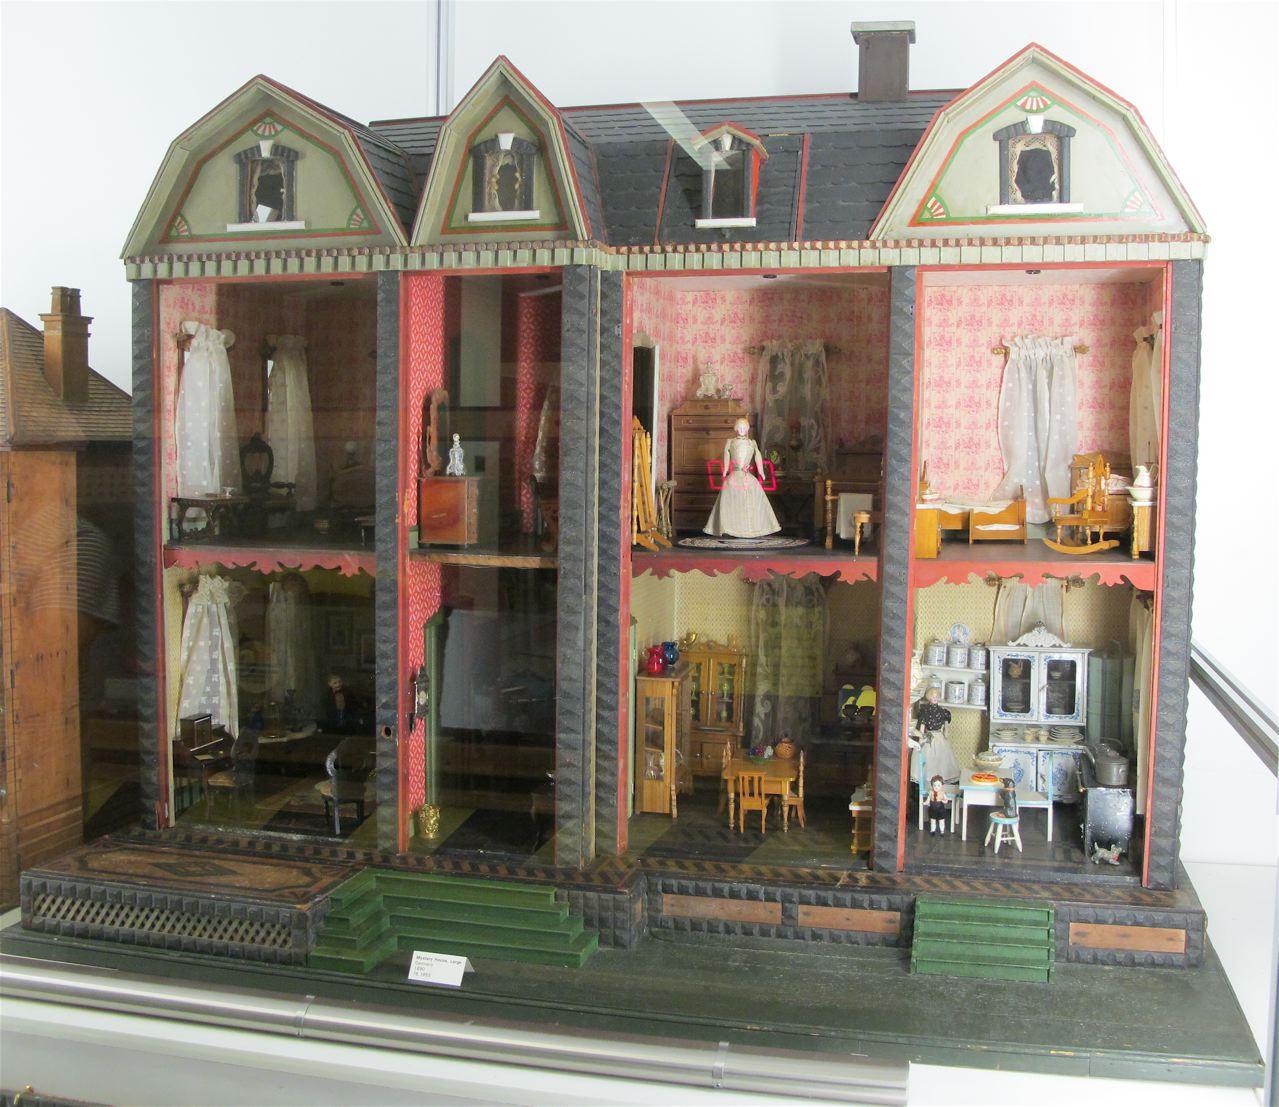 Susan S Mini Homes F A O Schwartz Mystery Dolls House